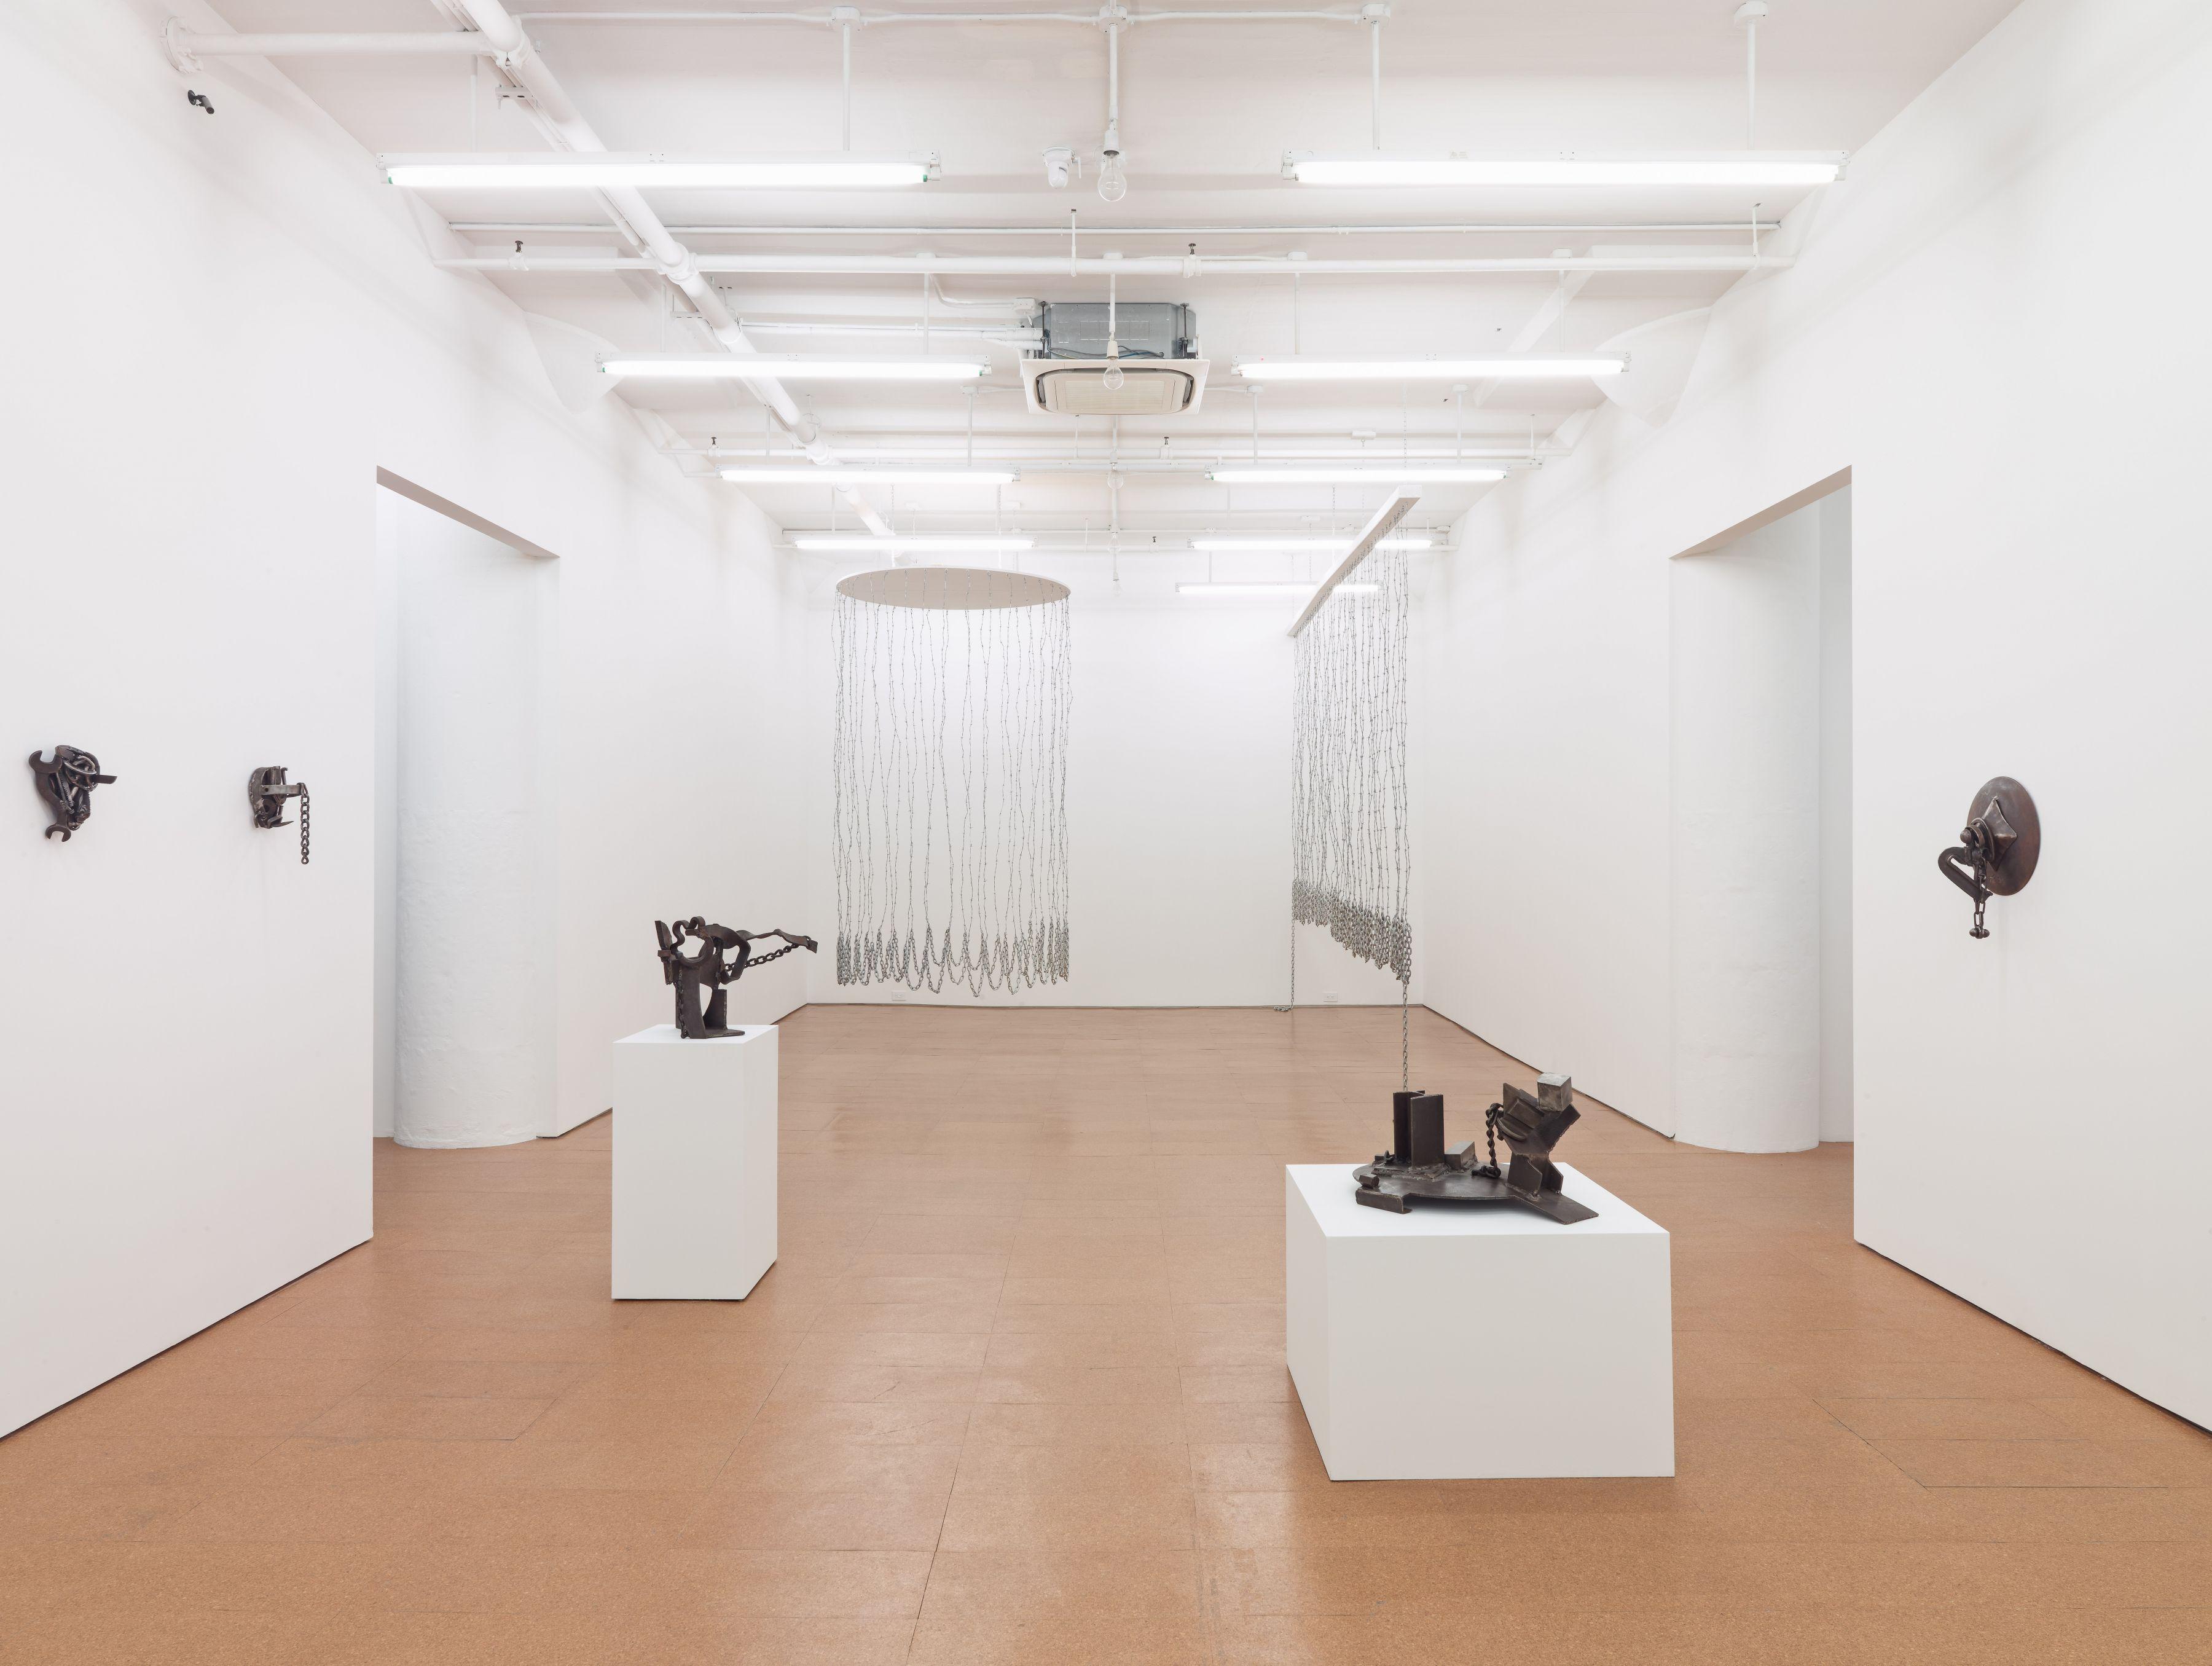 Melvin Edwards, Installation view, Alexander Gray Associates, 2012